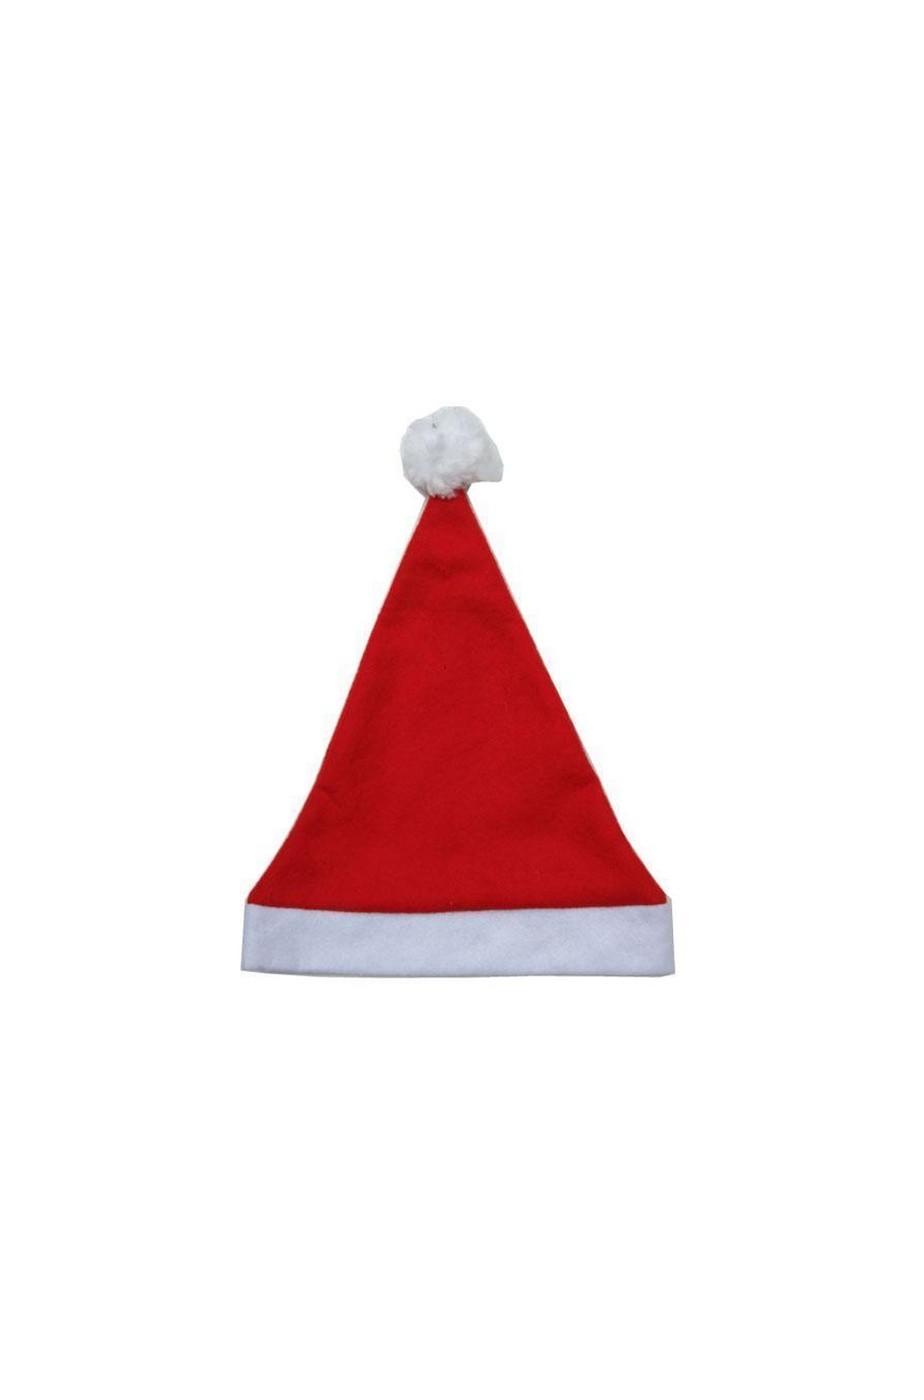 Bambine Natale Manica ad Aletta Caramelle STICK Babbo Natale Natale con cintura T Shirt Top